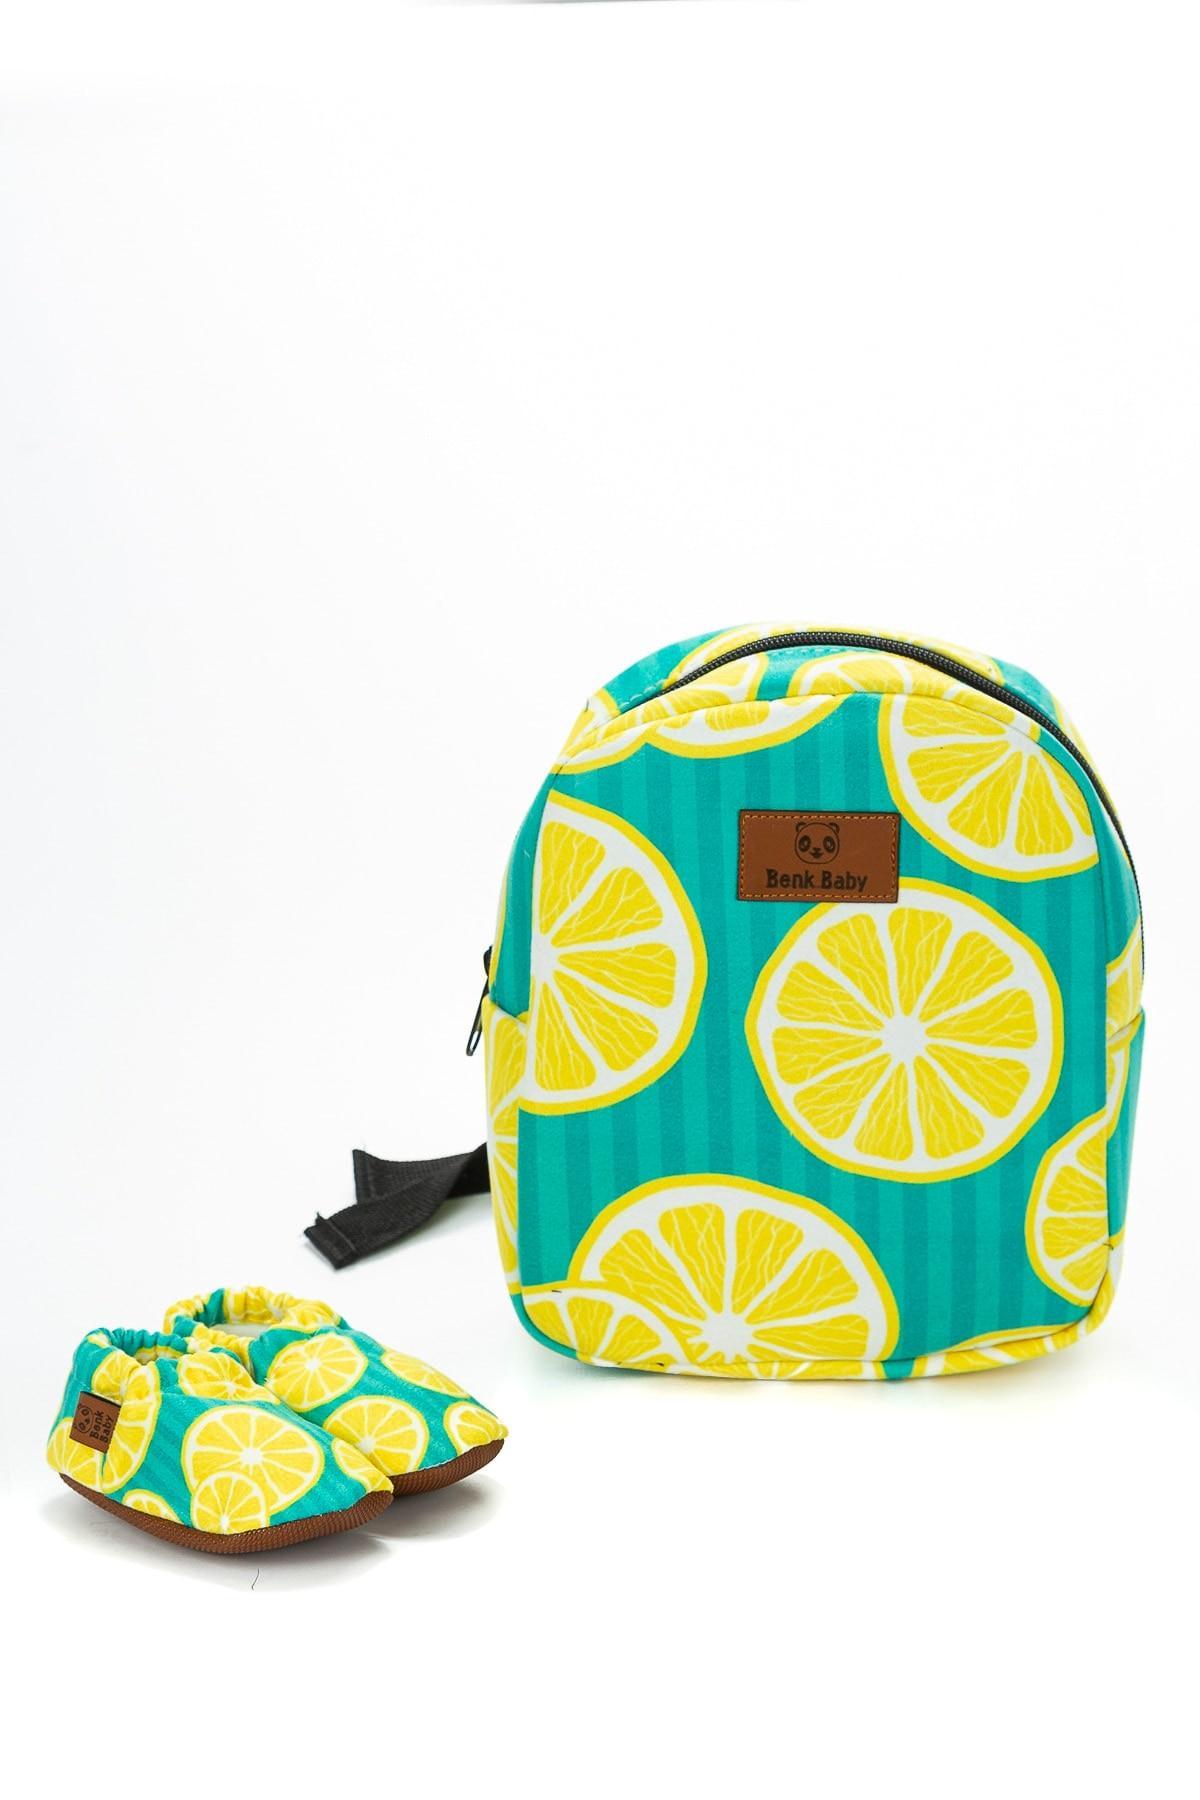 Flaneur Baby Lemon Model Non-Slip Baby Booties And Bag Set 2021 Premium Quality